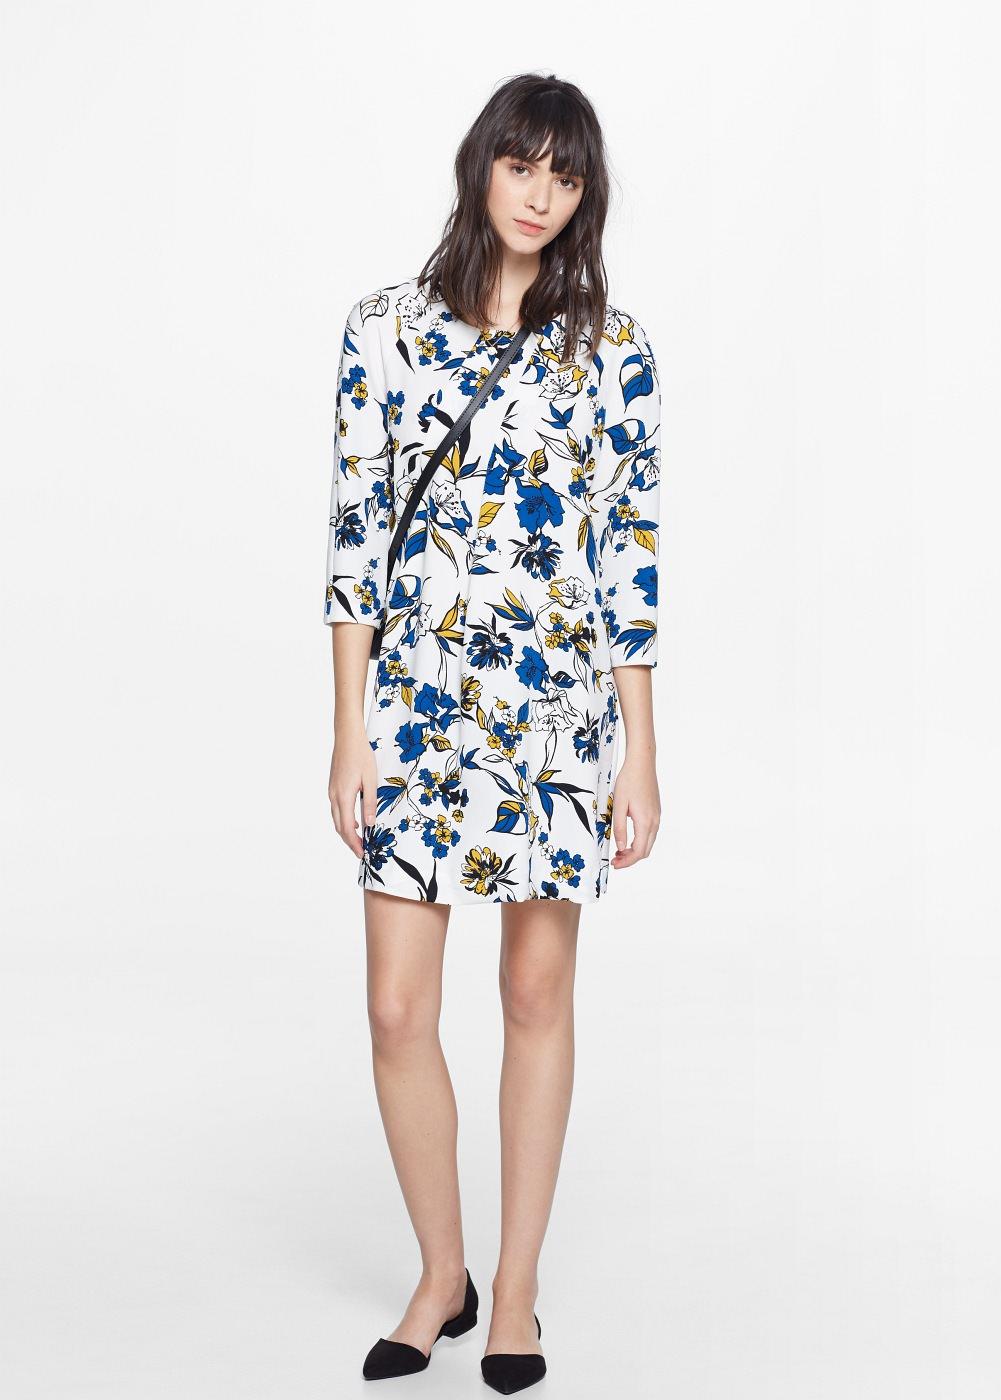 Seam Print dress , $79.99